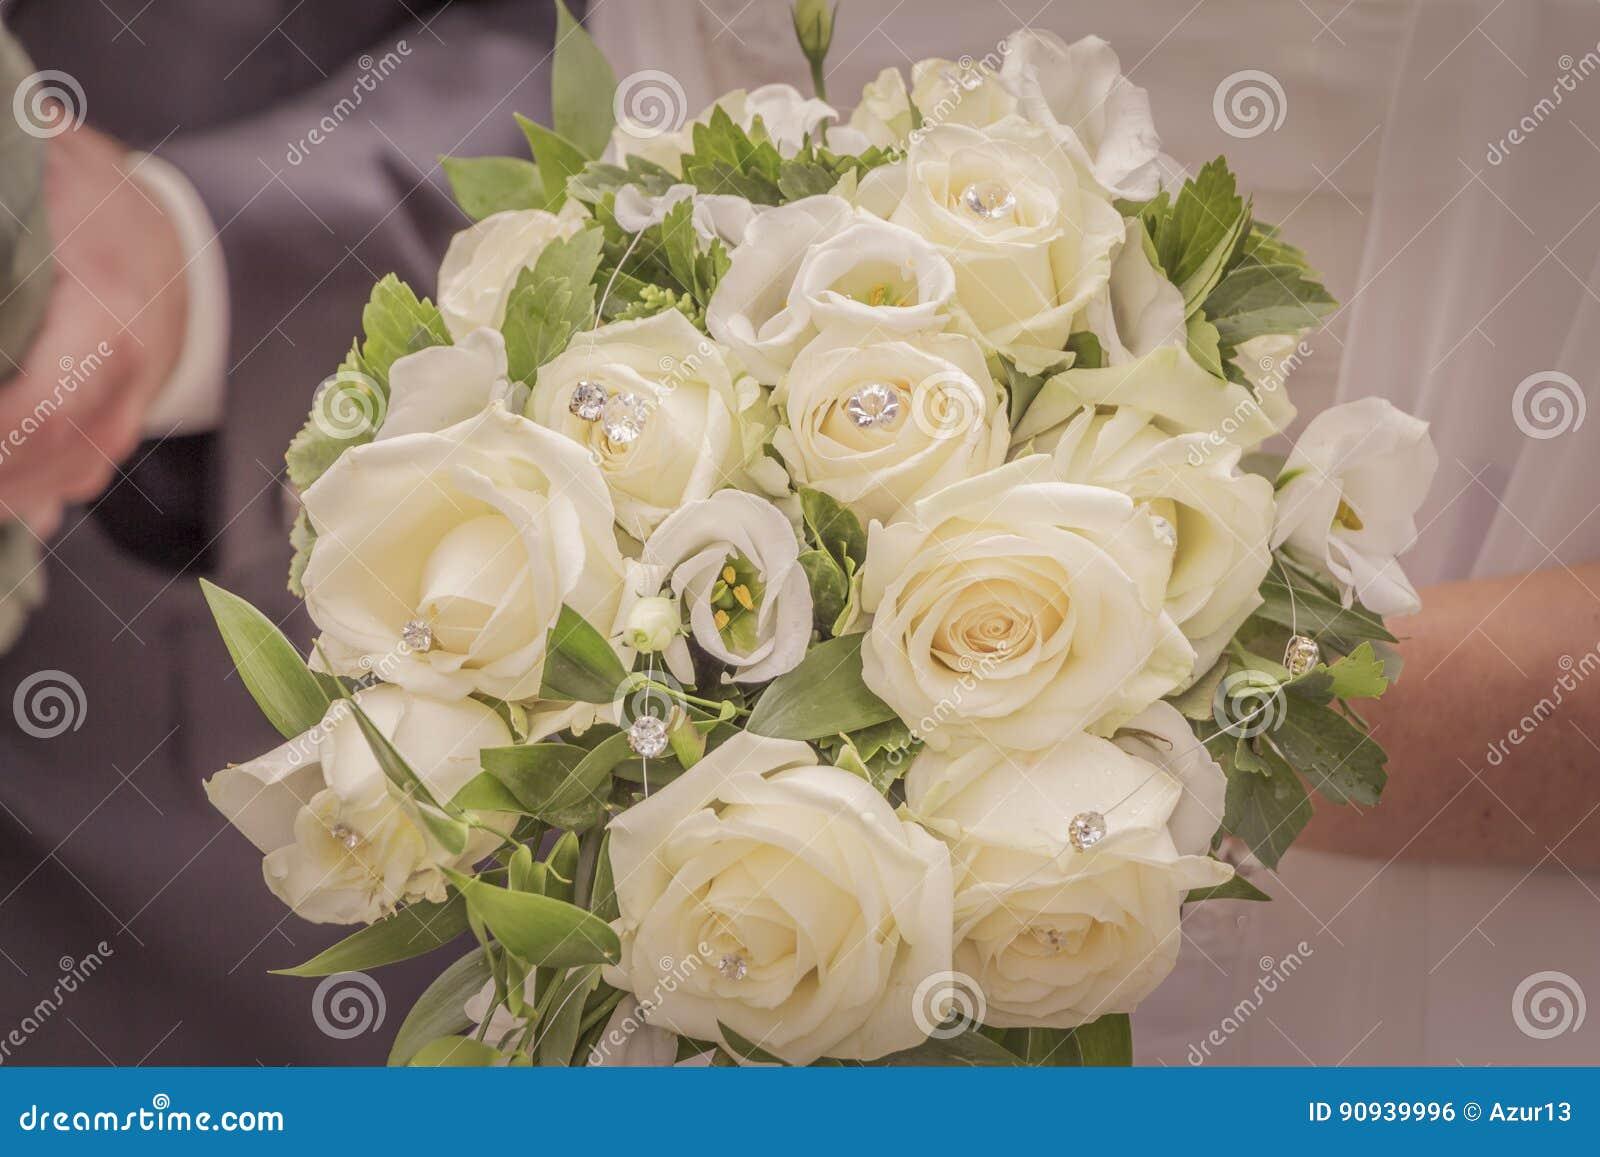 Wonderful Roses Stock Photography | CartoonDealer.com ...